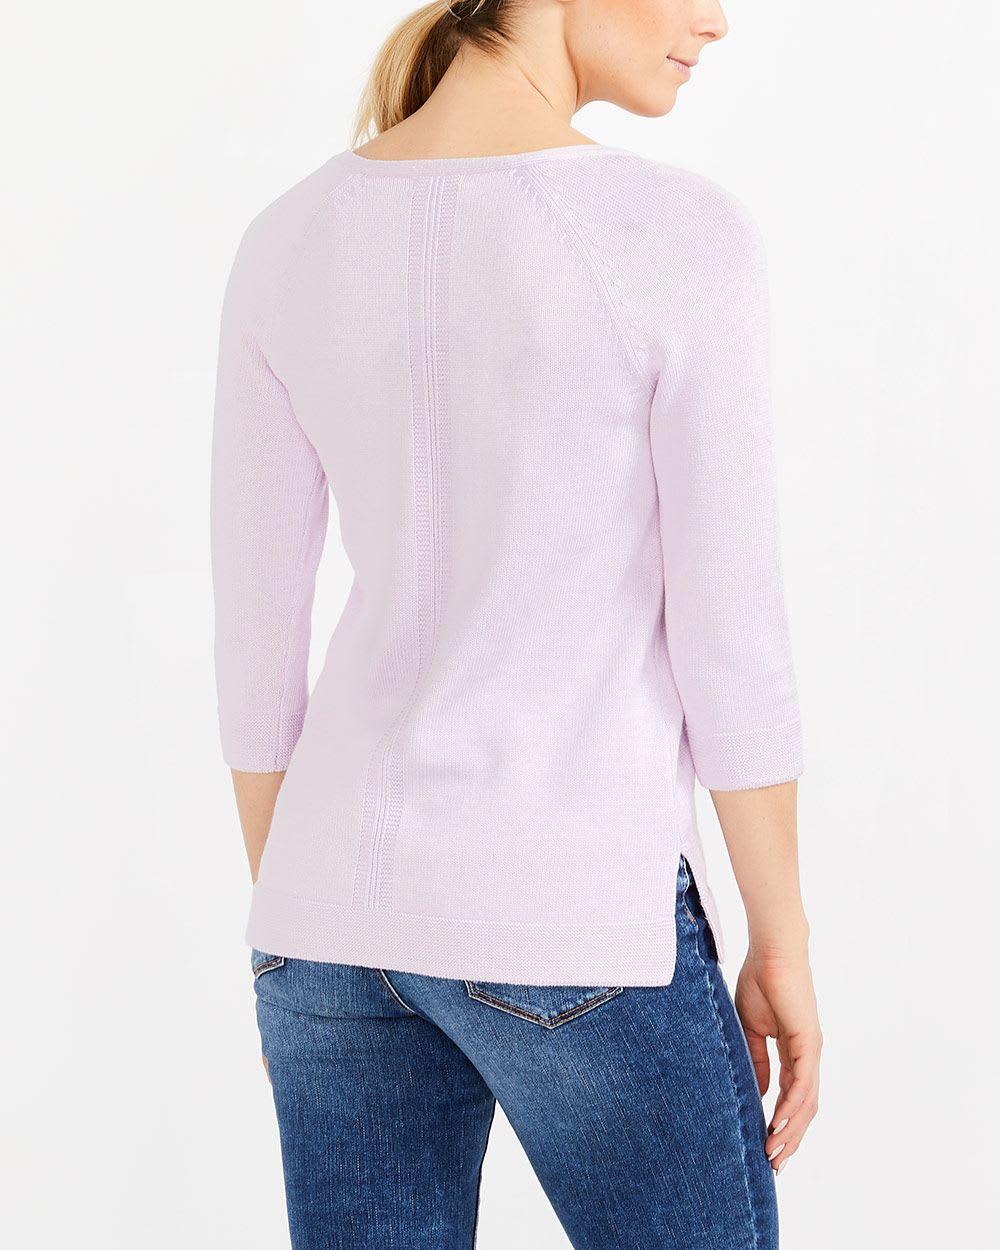 ¾ Raglan Sleeve Sweater